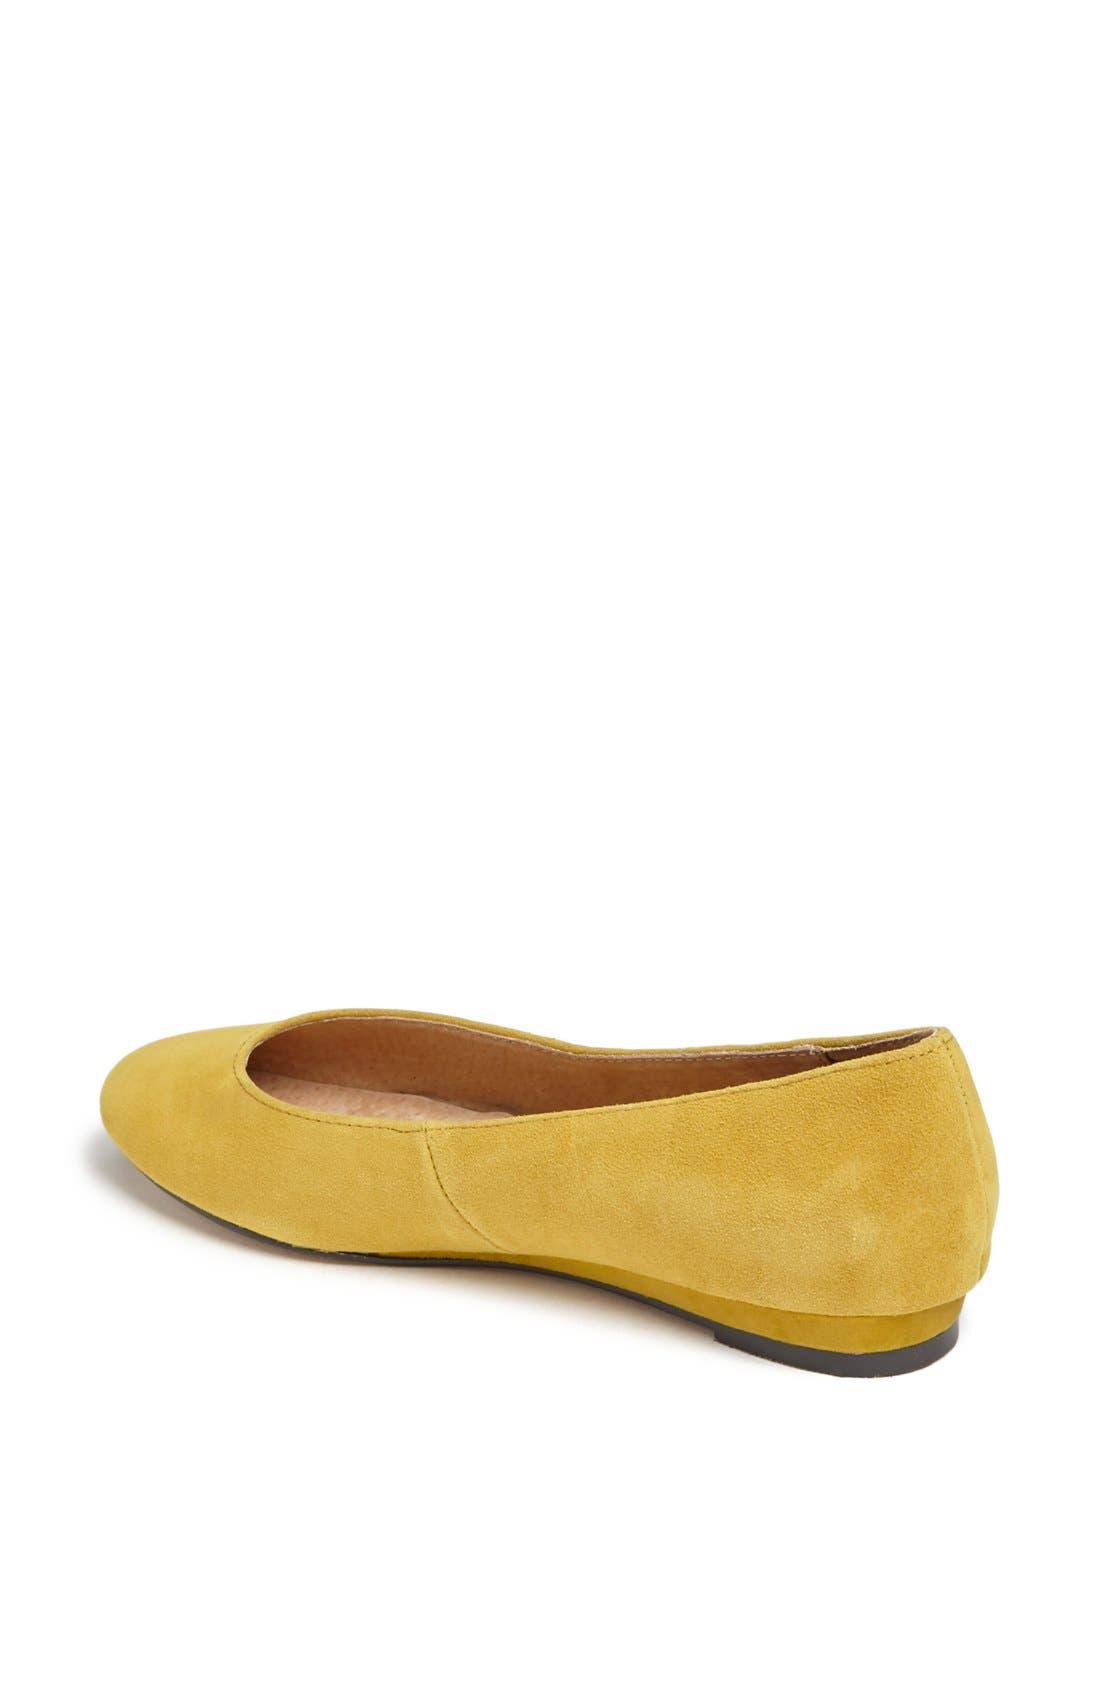 'Mello Mini Wedge' Court Shoe,                             Alternate thumbnail 2, color,                             Mustard